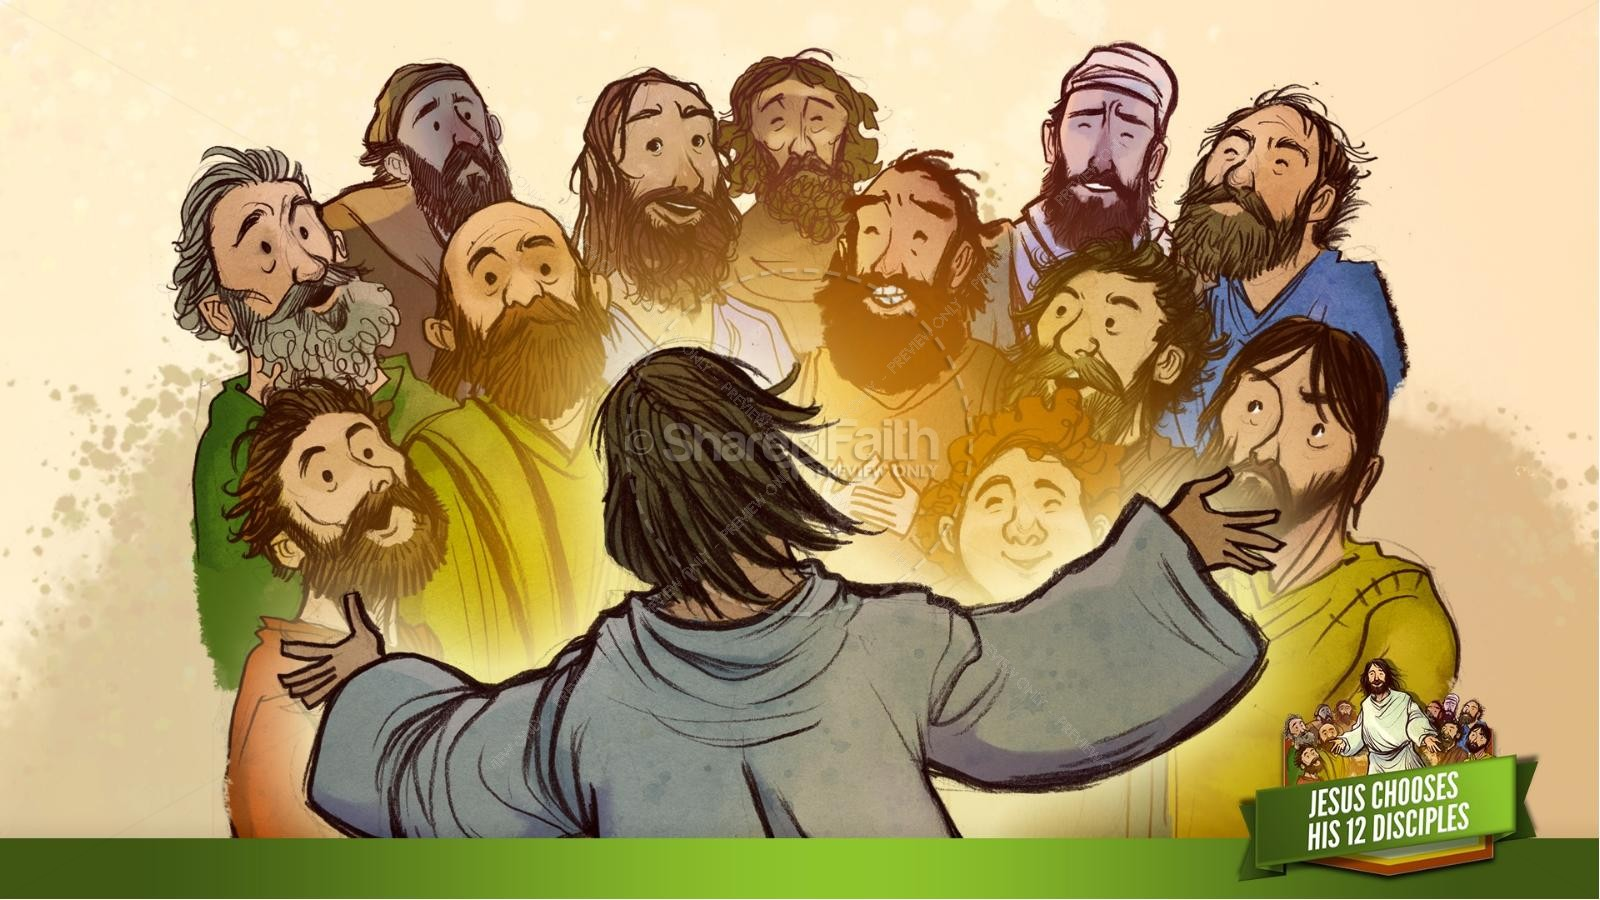 Jesus Chooses His 12 Disciples Kids Bible Story | slide 29